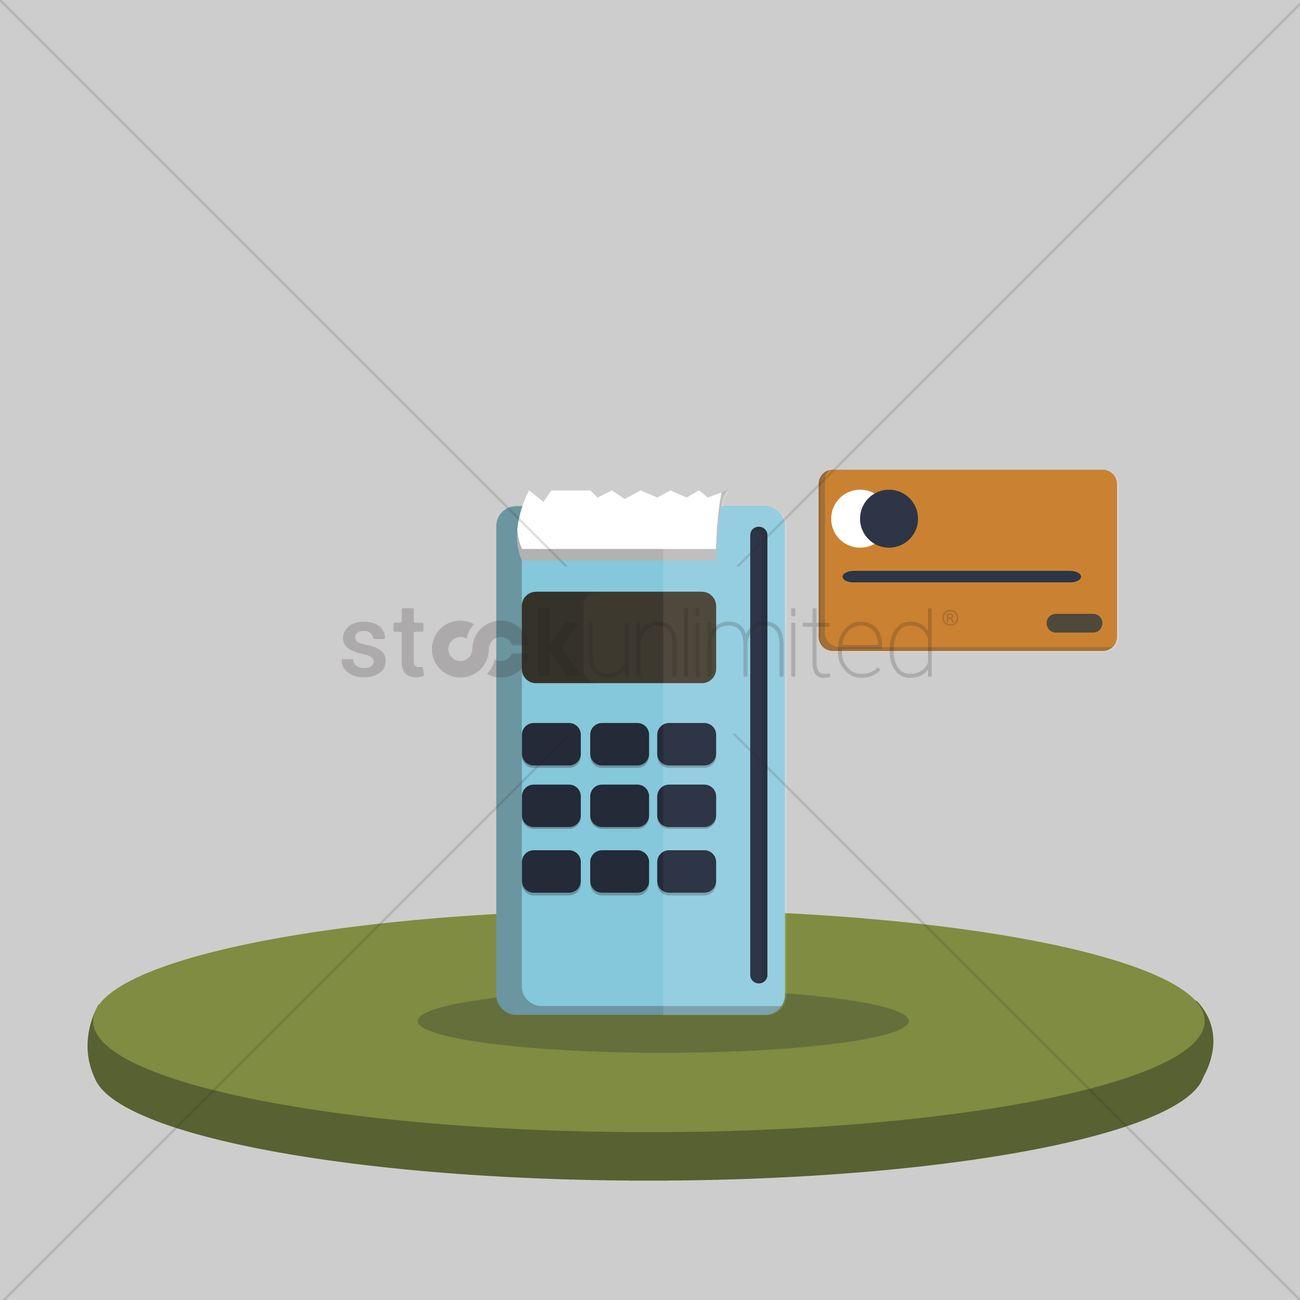 1300x1300 Free Illustration Of A Card Swipe Machine Vector Image